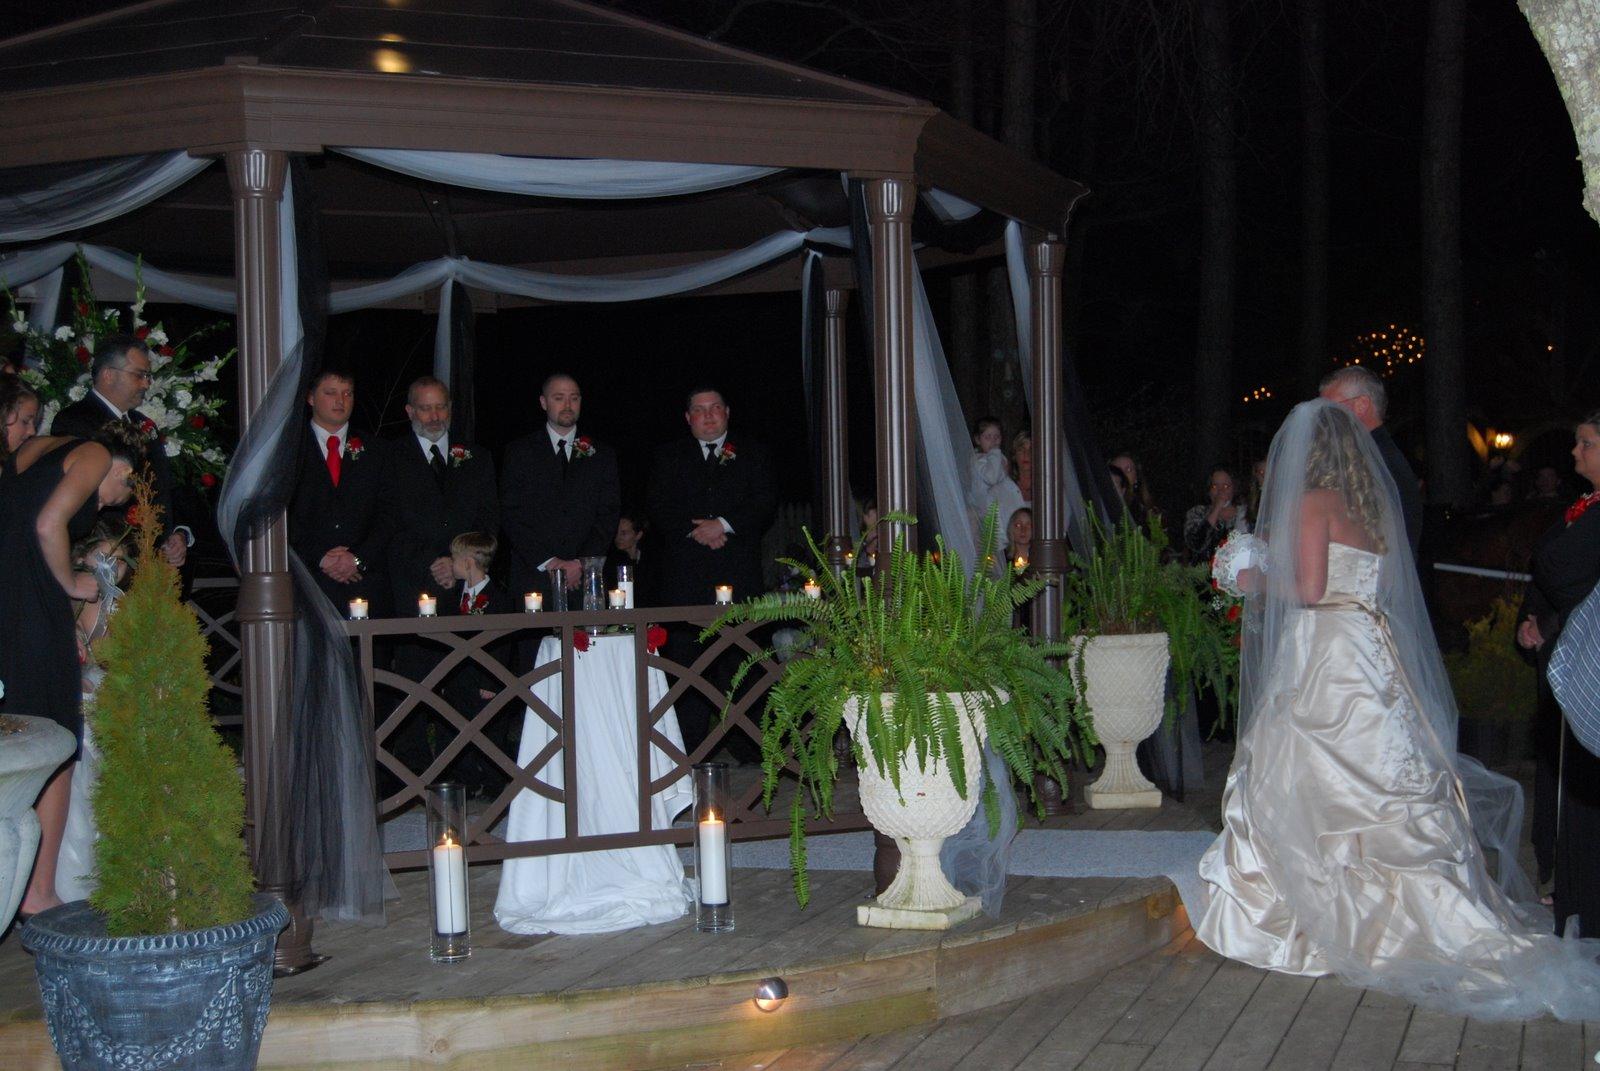 More weddings....